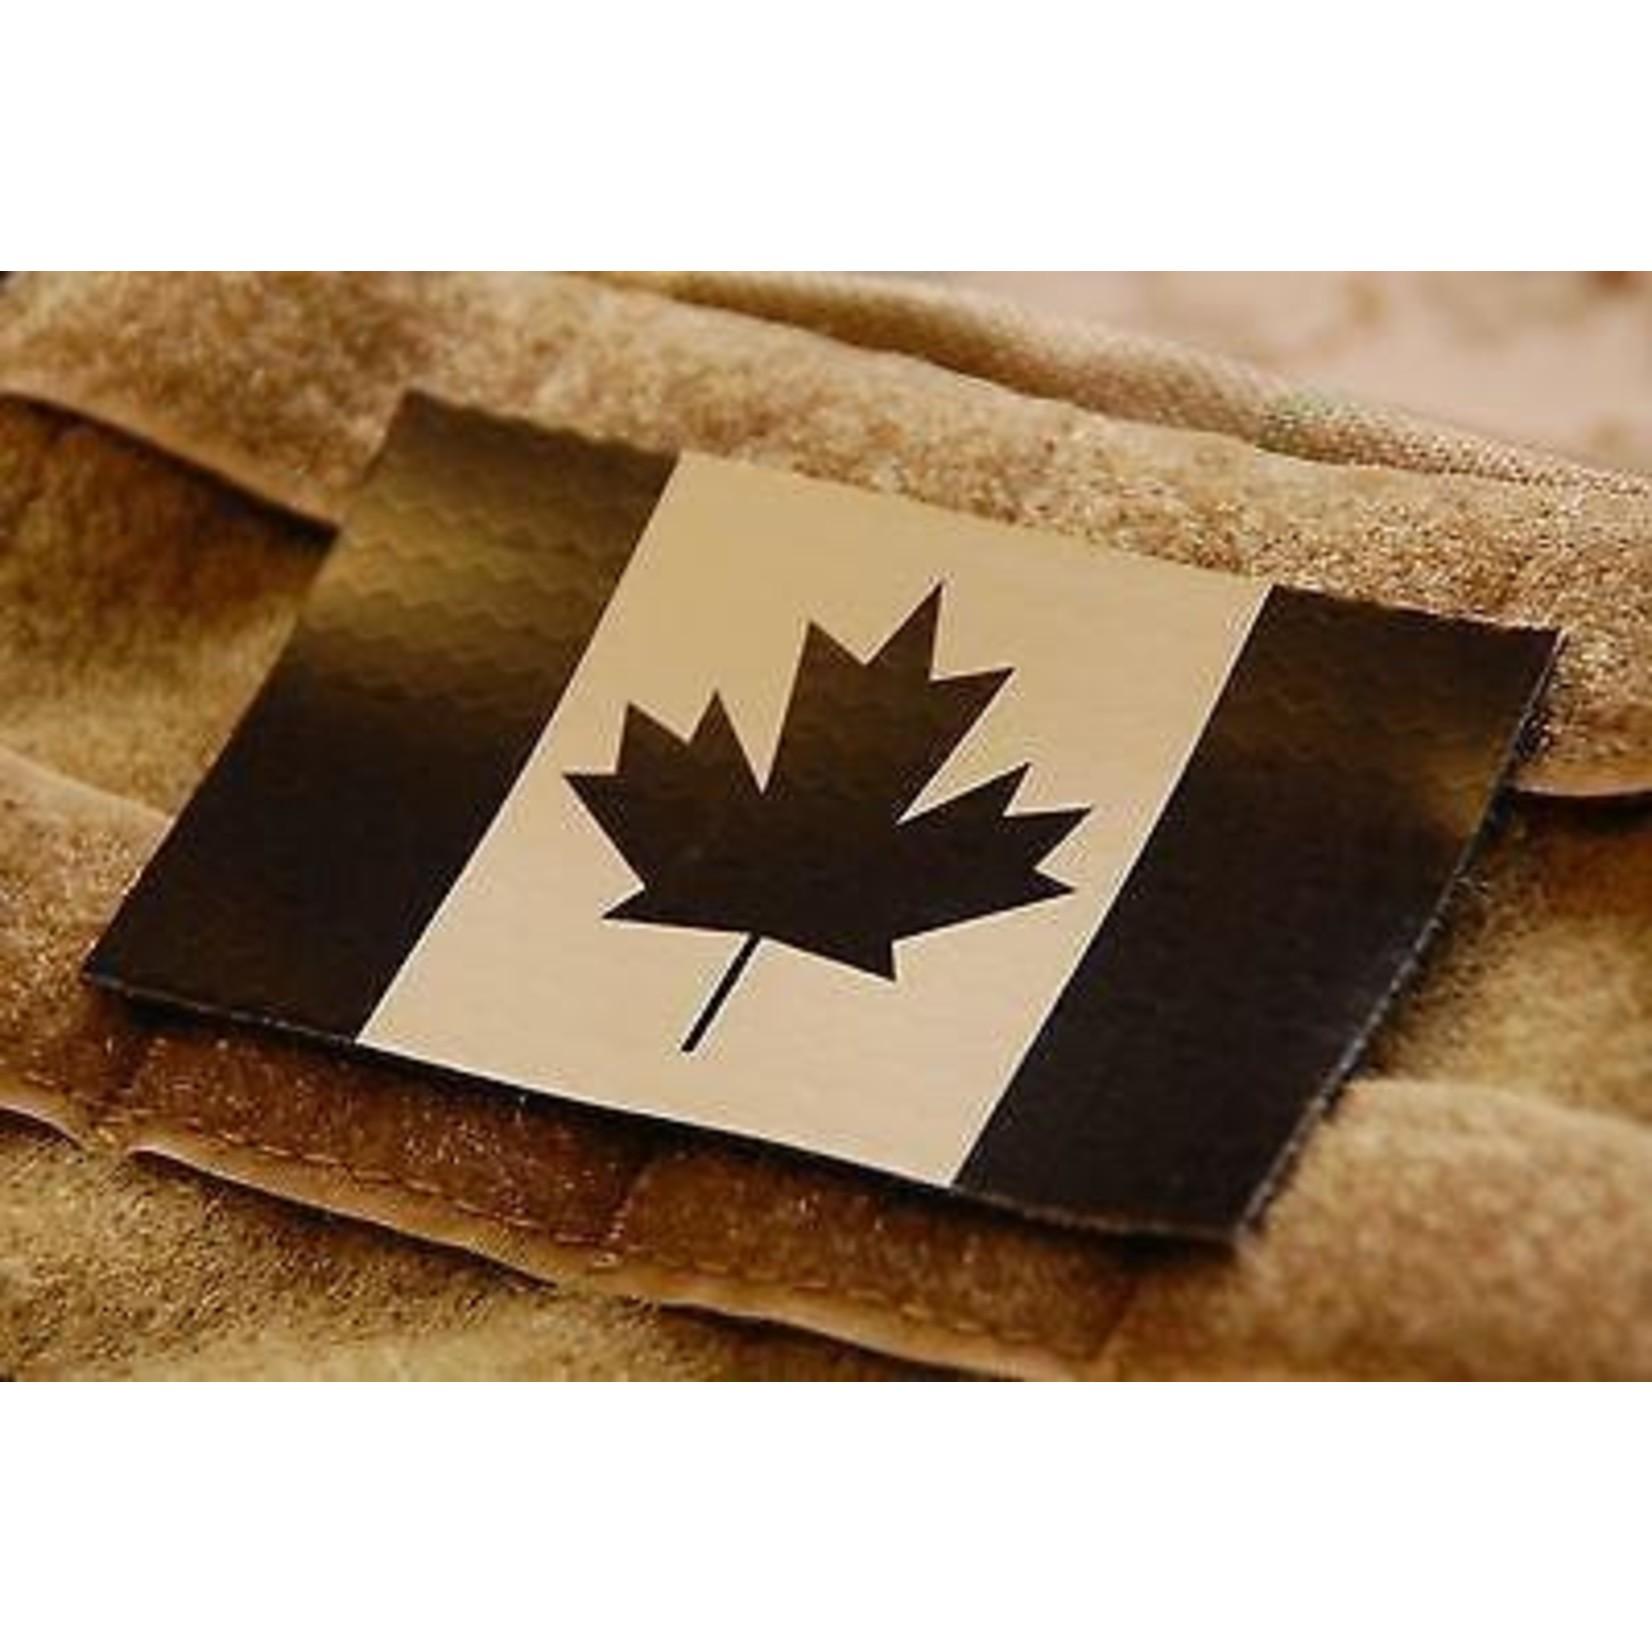 SDTAC INFRARED CANADIAN FLAG PATCH - TAN & BLACK